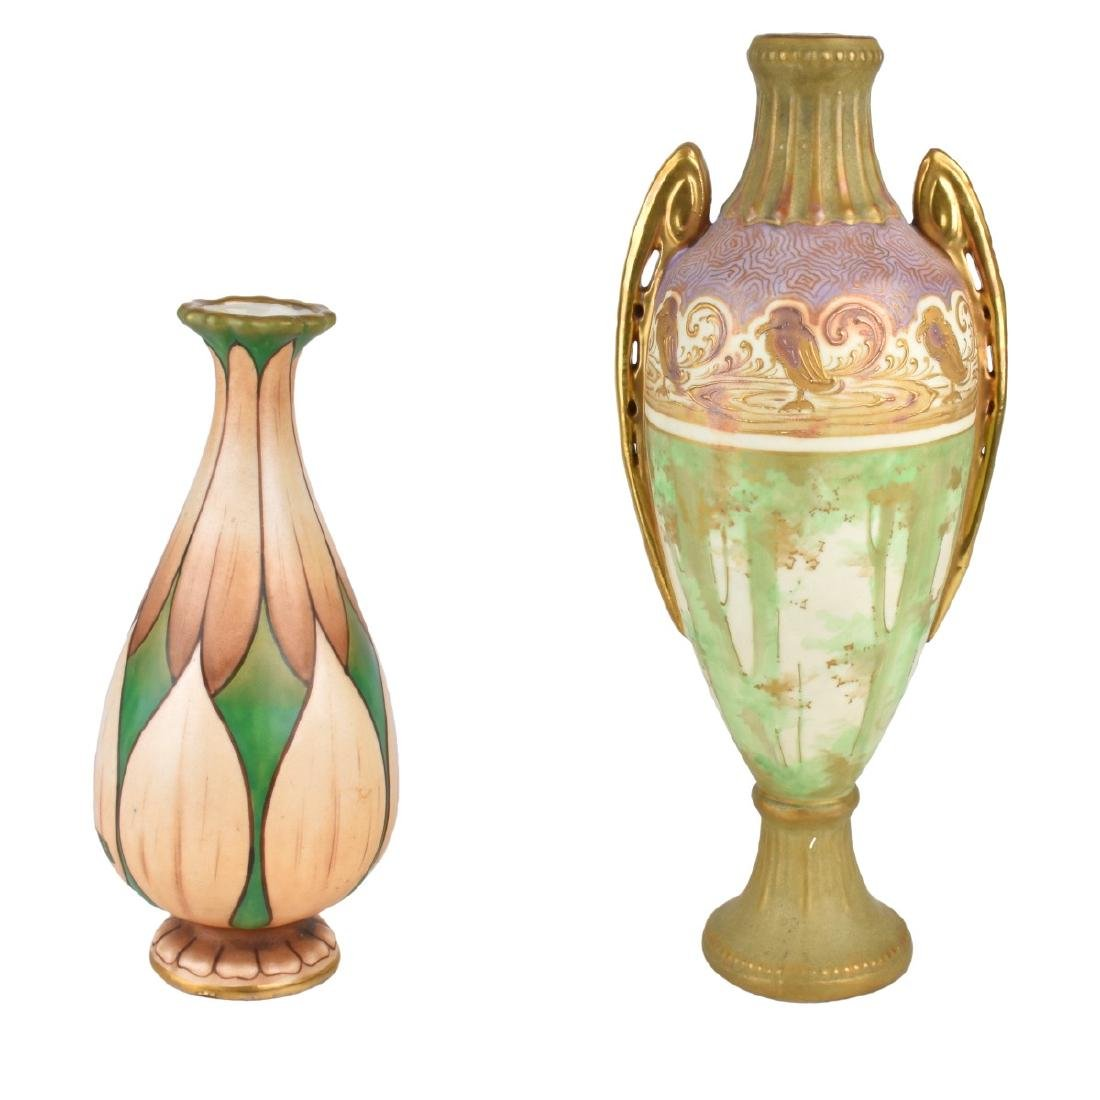 Two (2) Piece Amphora Lot